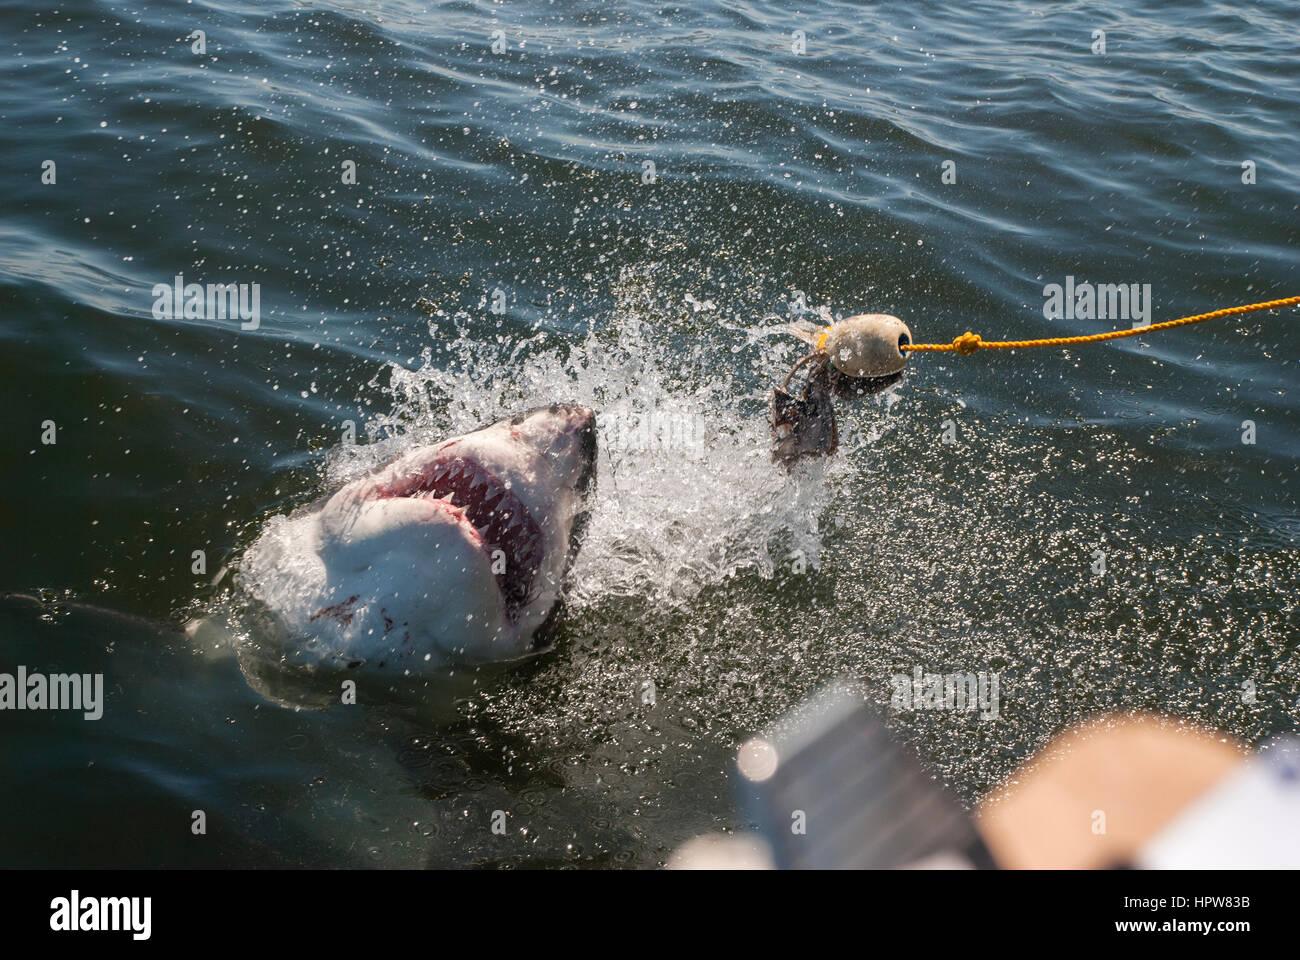 White Shark Gills Imágenes De Stock & White Shark Gills Fotos De ...